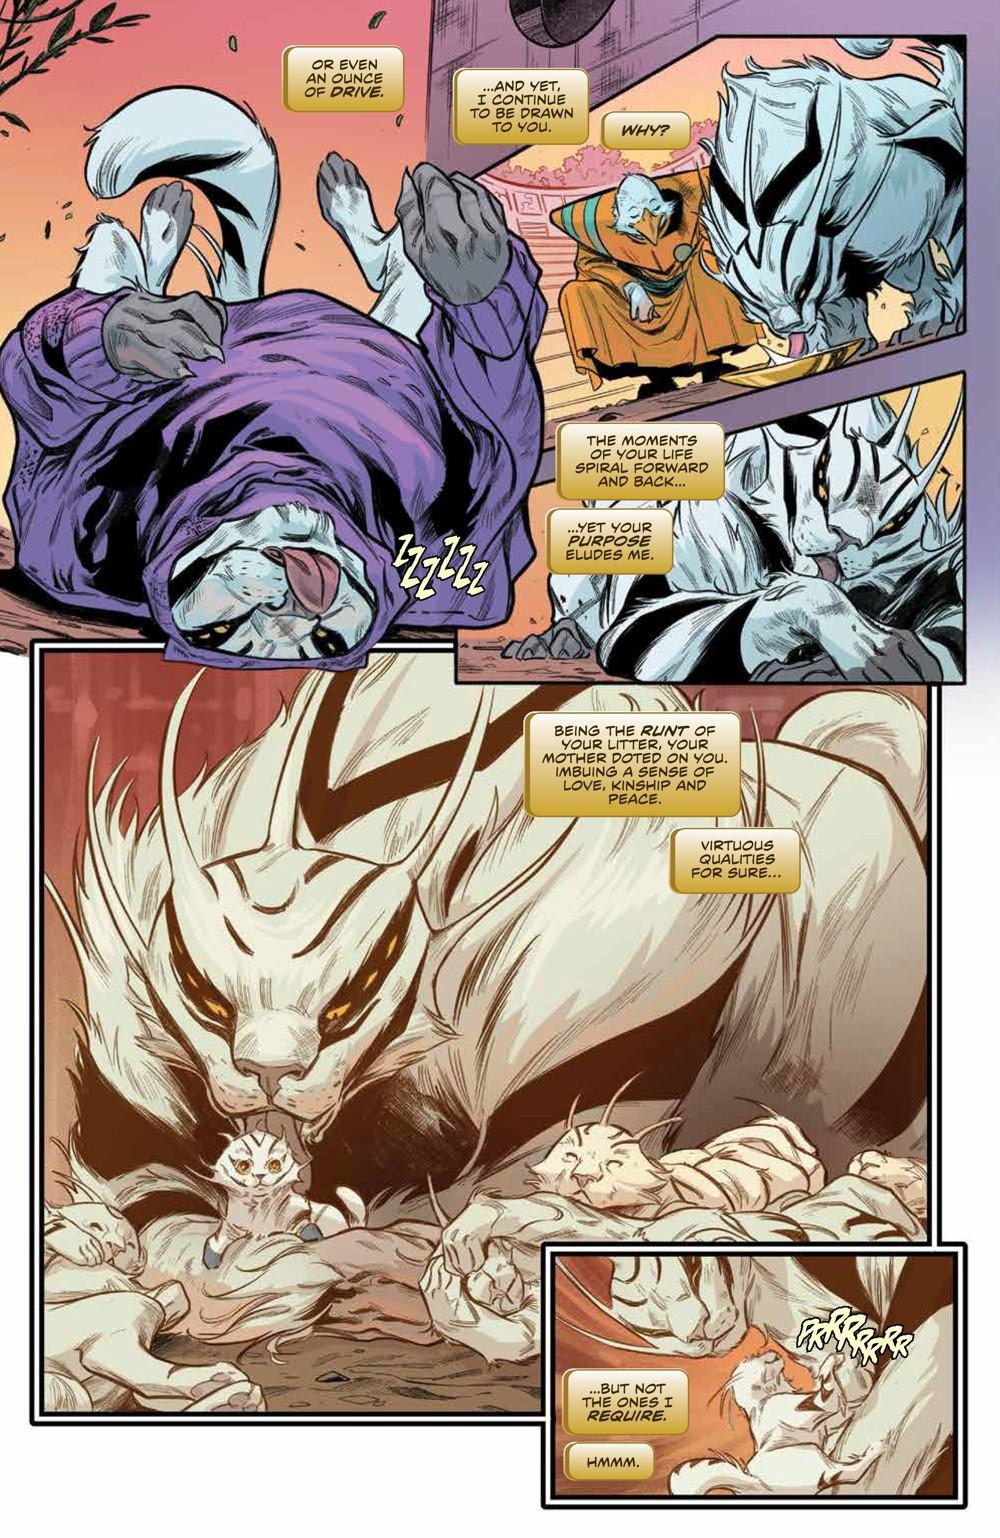 PowerRangers_010_PRESS_7 ComicList Previews: POWER RANGERS #10